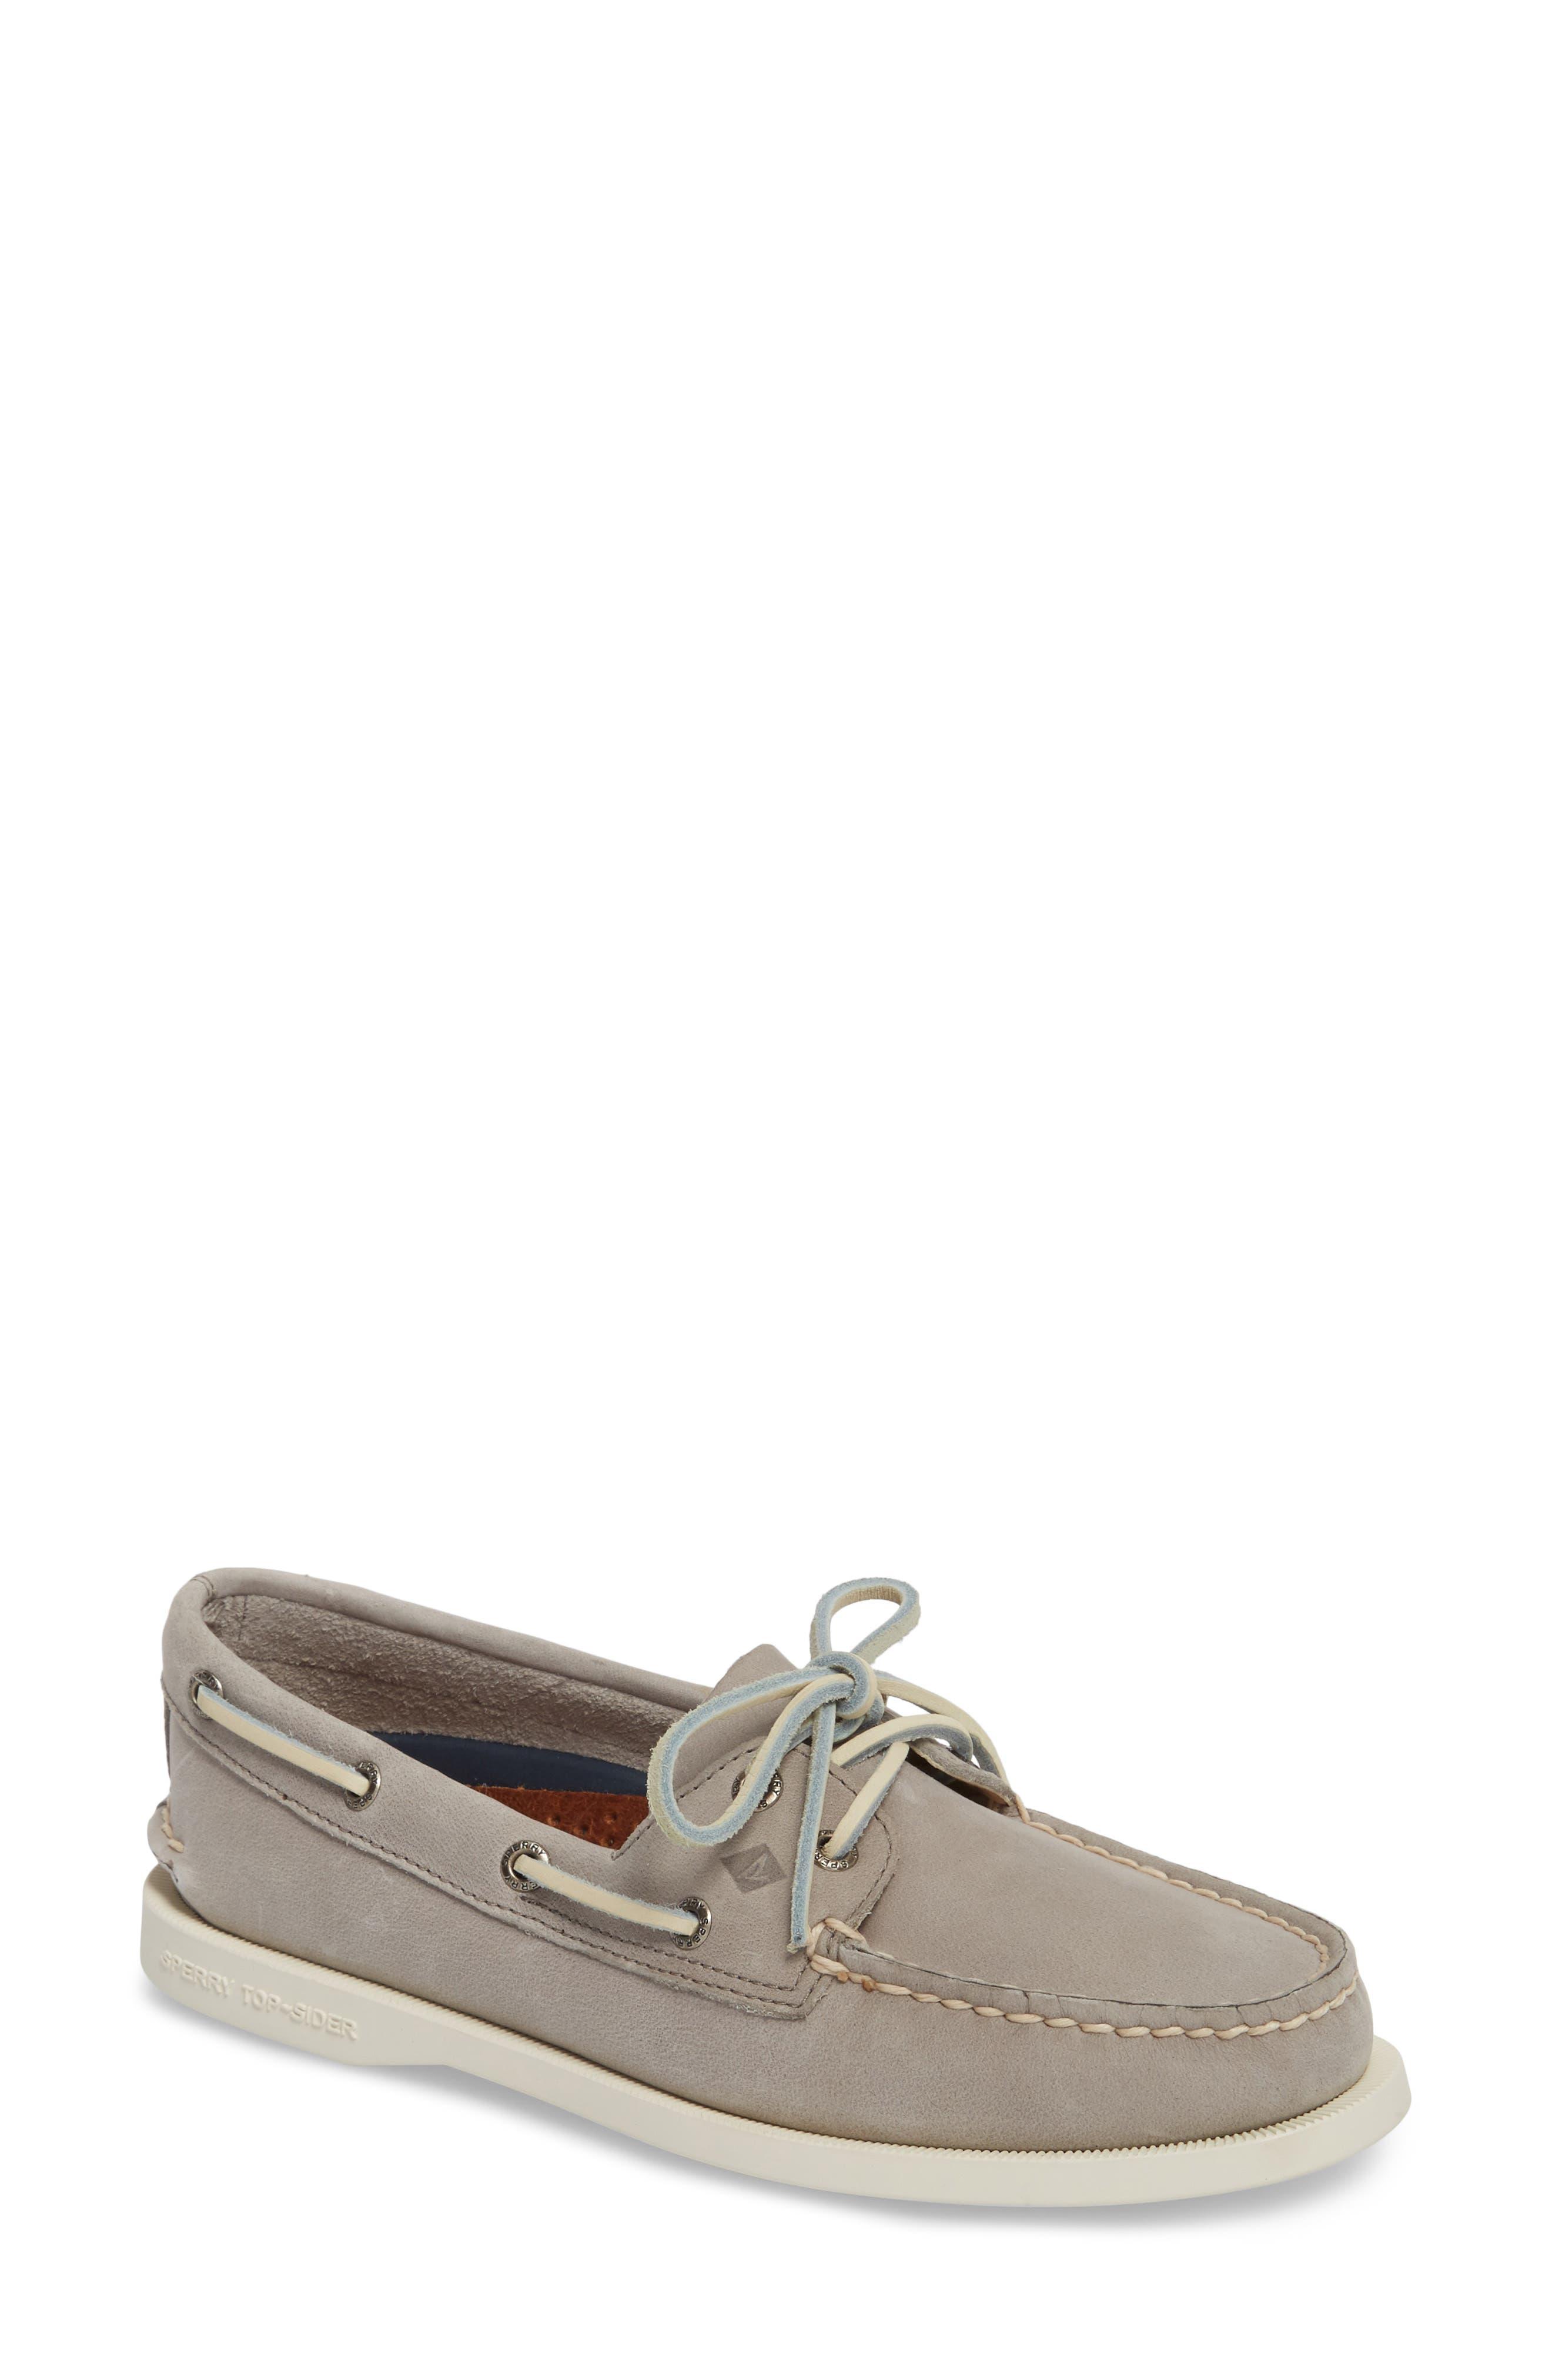 'Authentic Original' Boat Shoe,                             Main thumbnail 1, color,                             Grey Leather